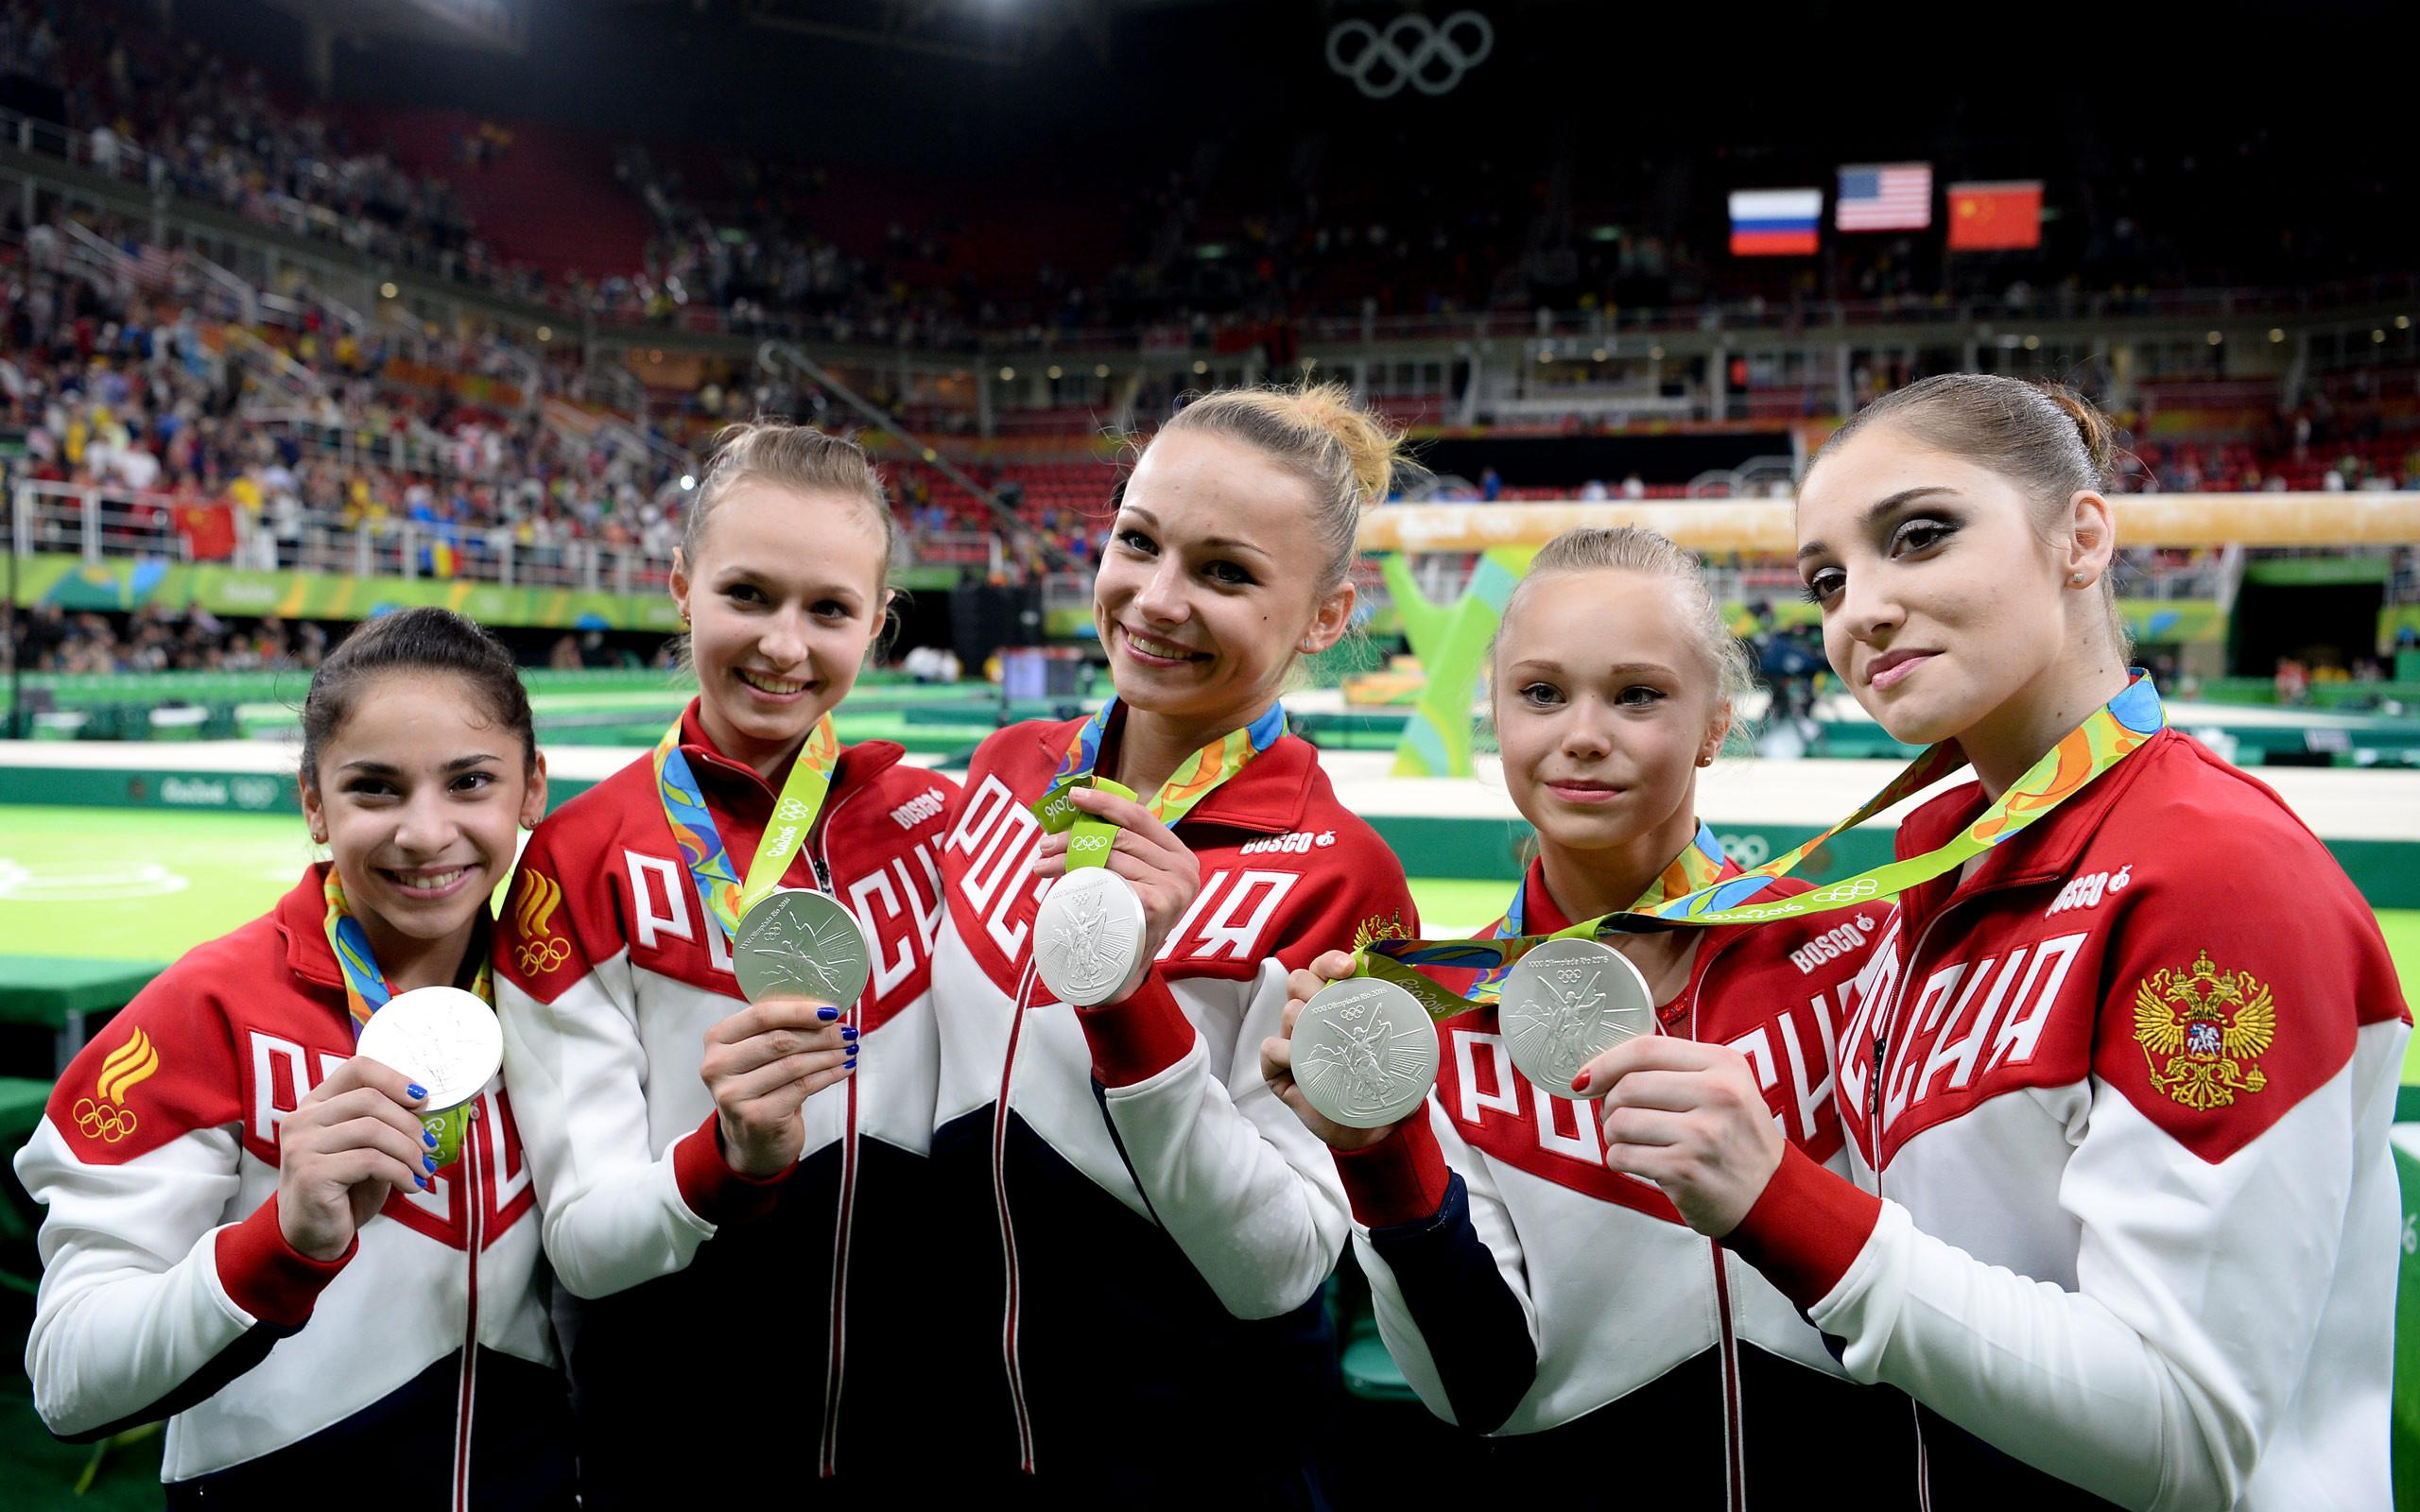 <p>Фото: &copy; РИА Новости/Алексей Филиппов</p>